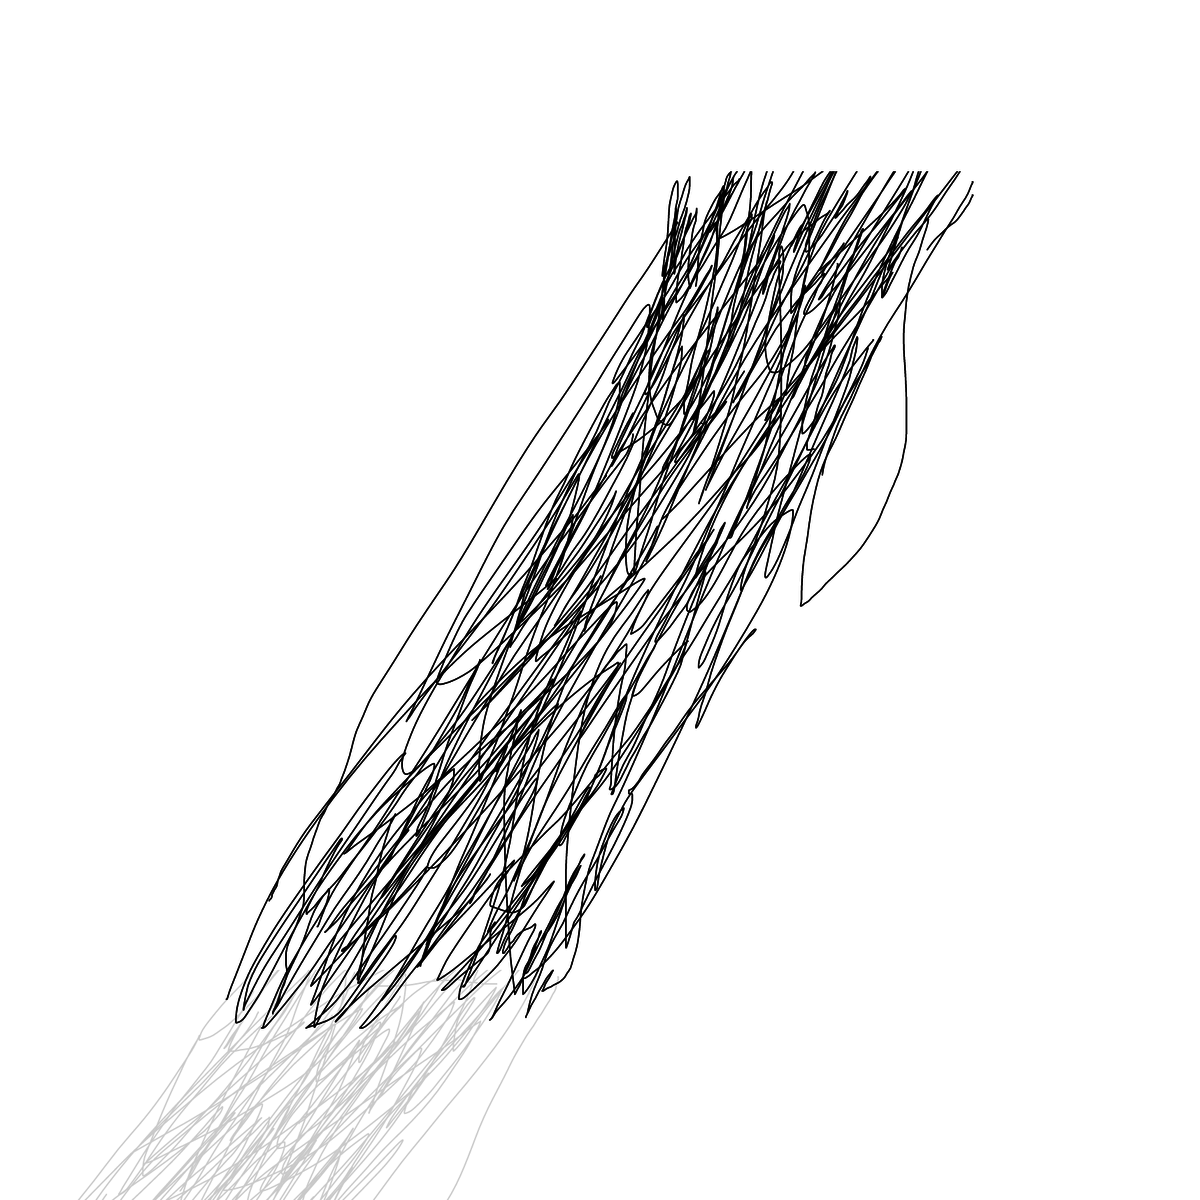 BAAAM drawing#6136 lat:51.3321762084960940lng: 12.3622903823852540